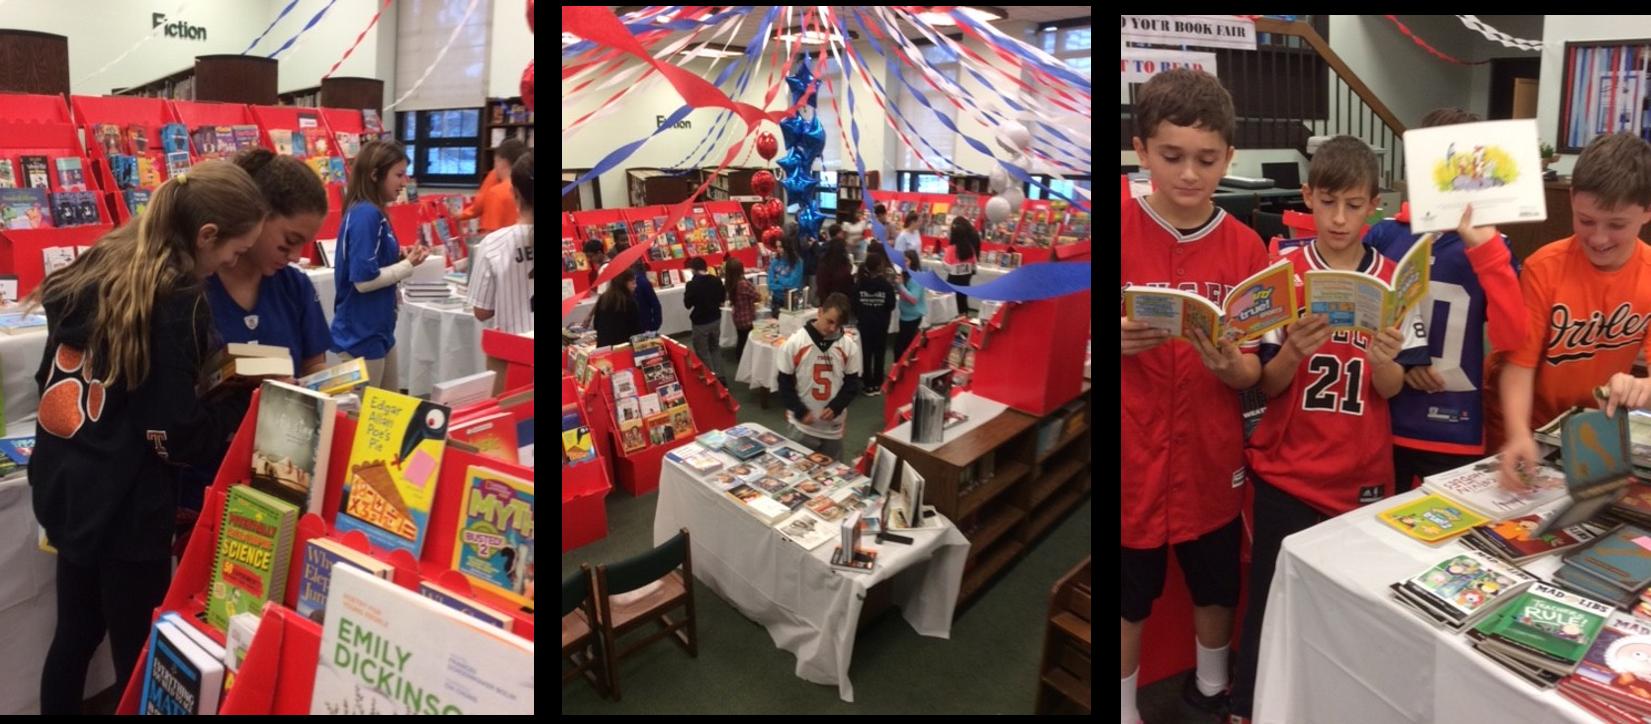 Tuckahoe MS/HS Bookfair